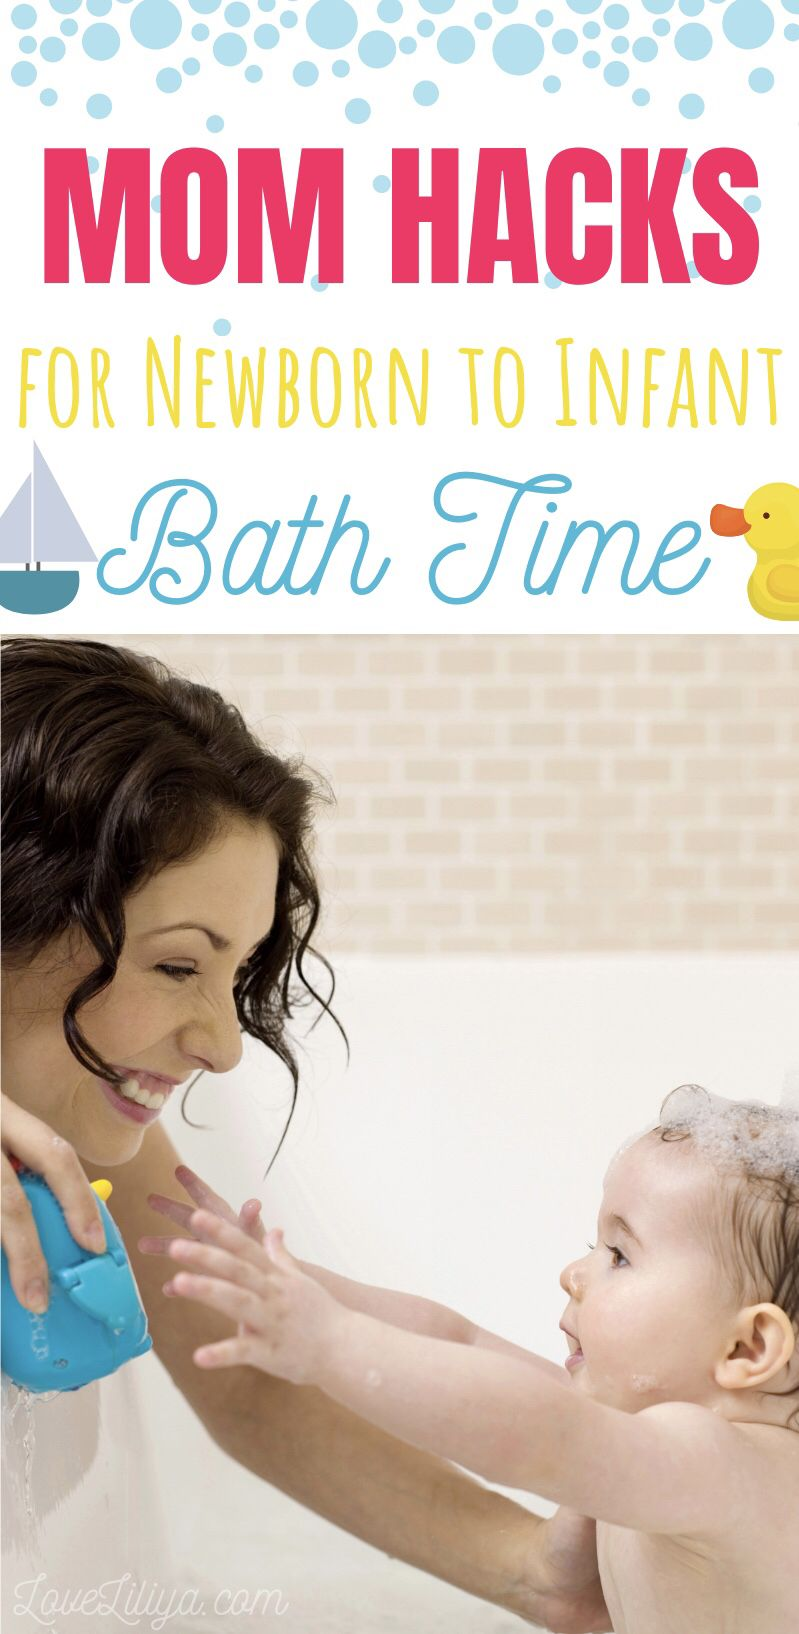 15 Mom Hacks To Know To Make Bath Time Easier Baby Bath Time Baby Bath Newborn